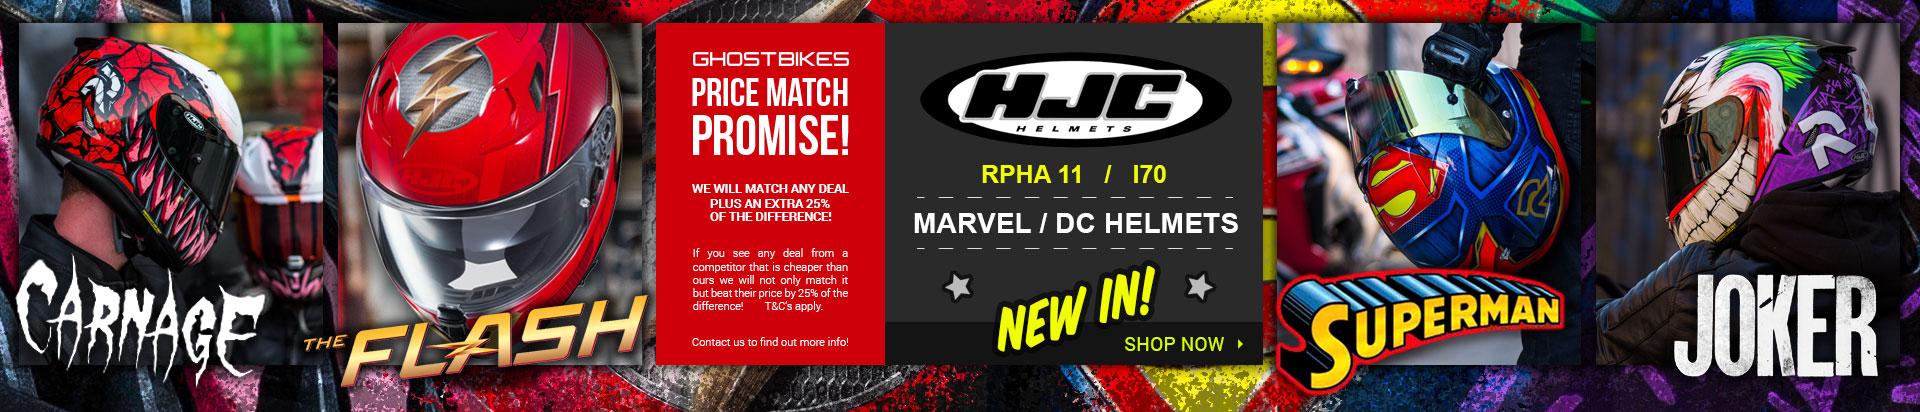 HJC Superheros